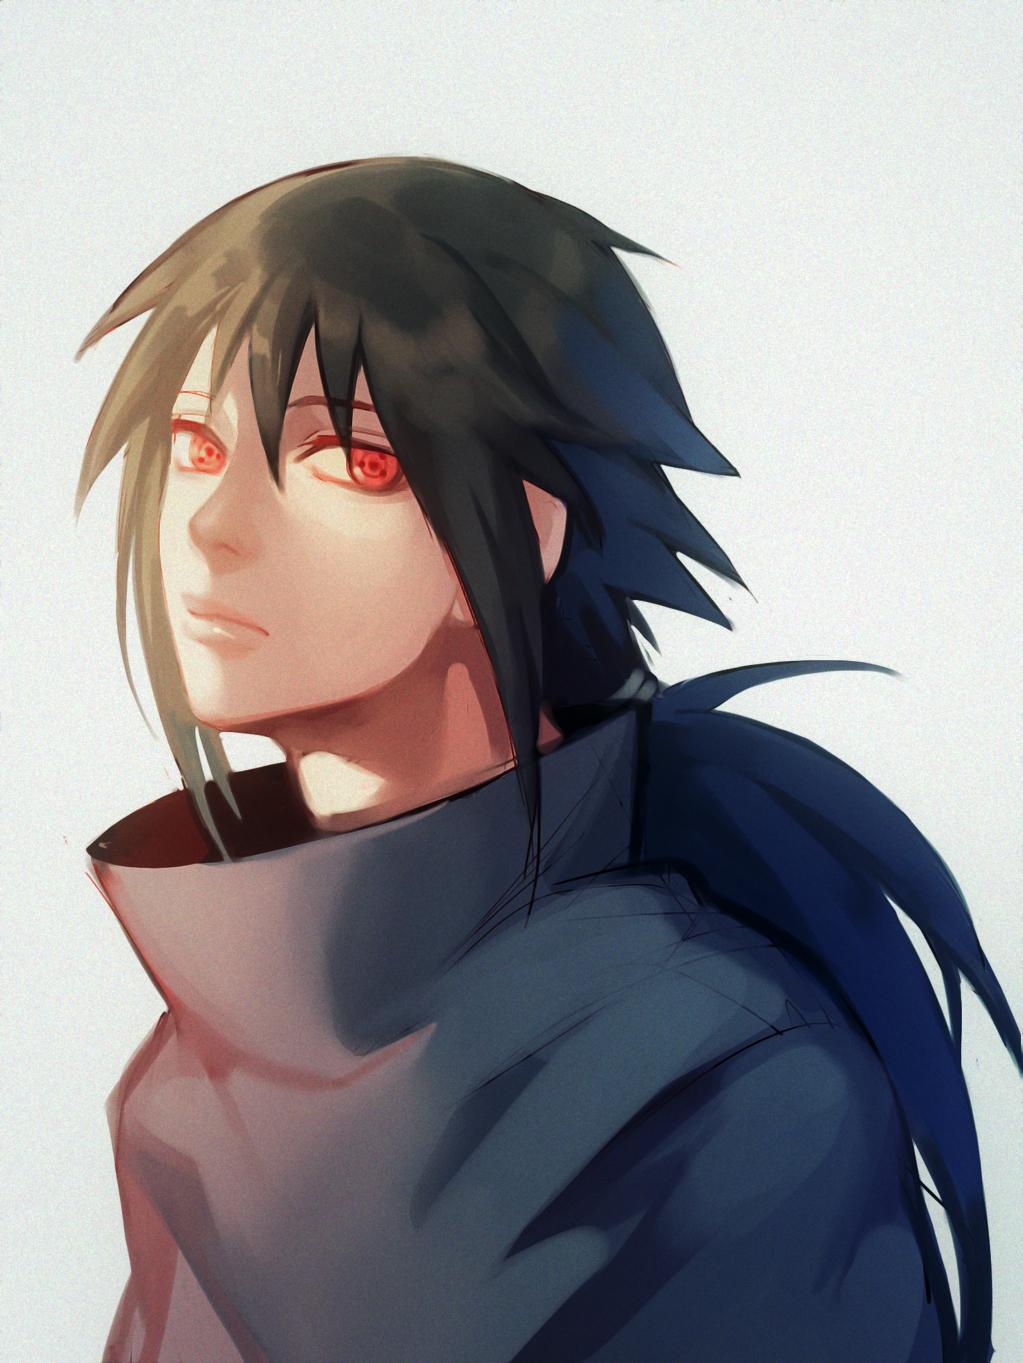 Uchiha Izuna - NARUTO - Zerochan Anime Image Board